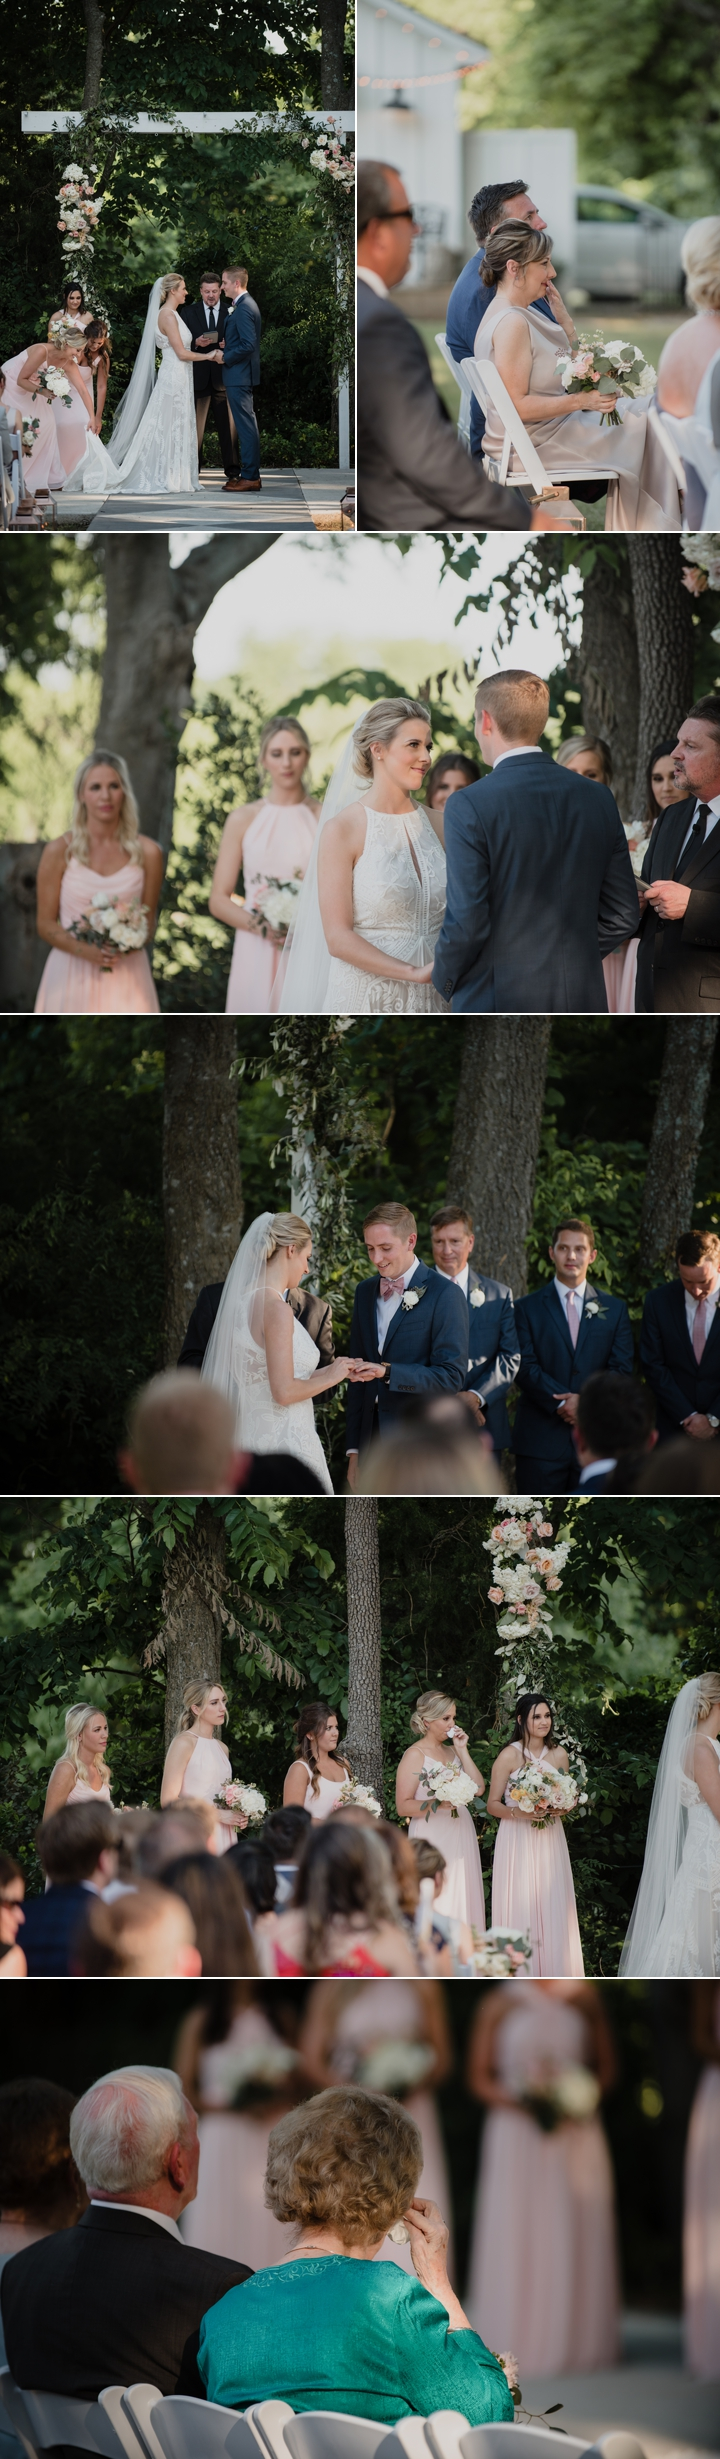 destination-wedding-photographers 13.jpg